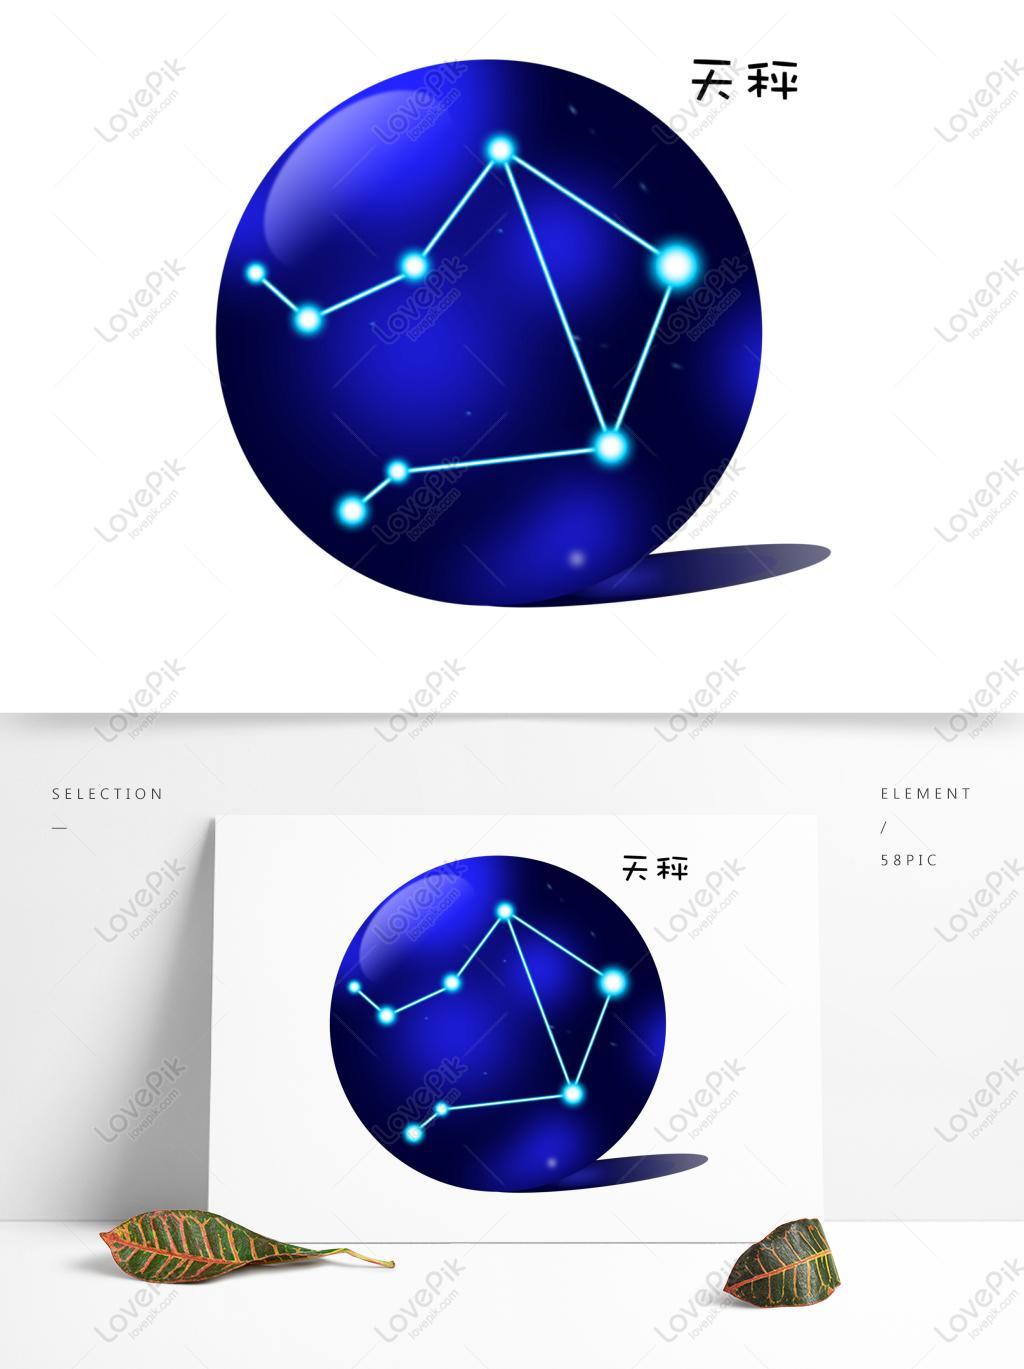 Twelve constellation libra illustration image_picture free